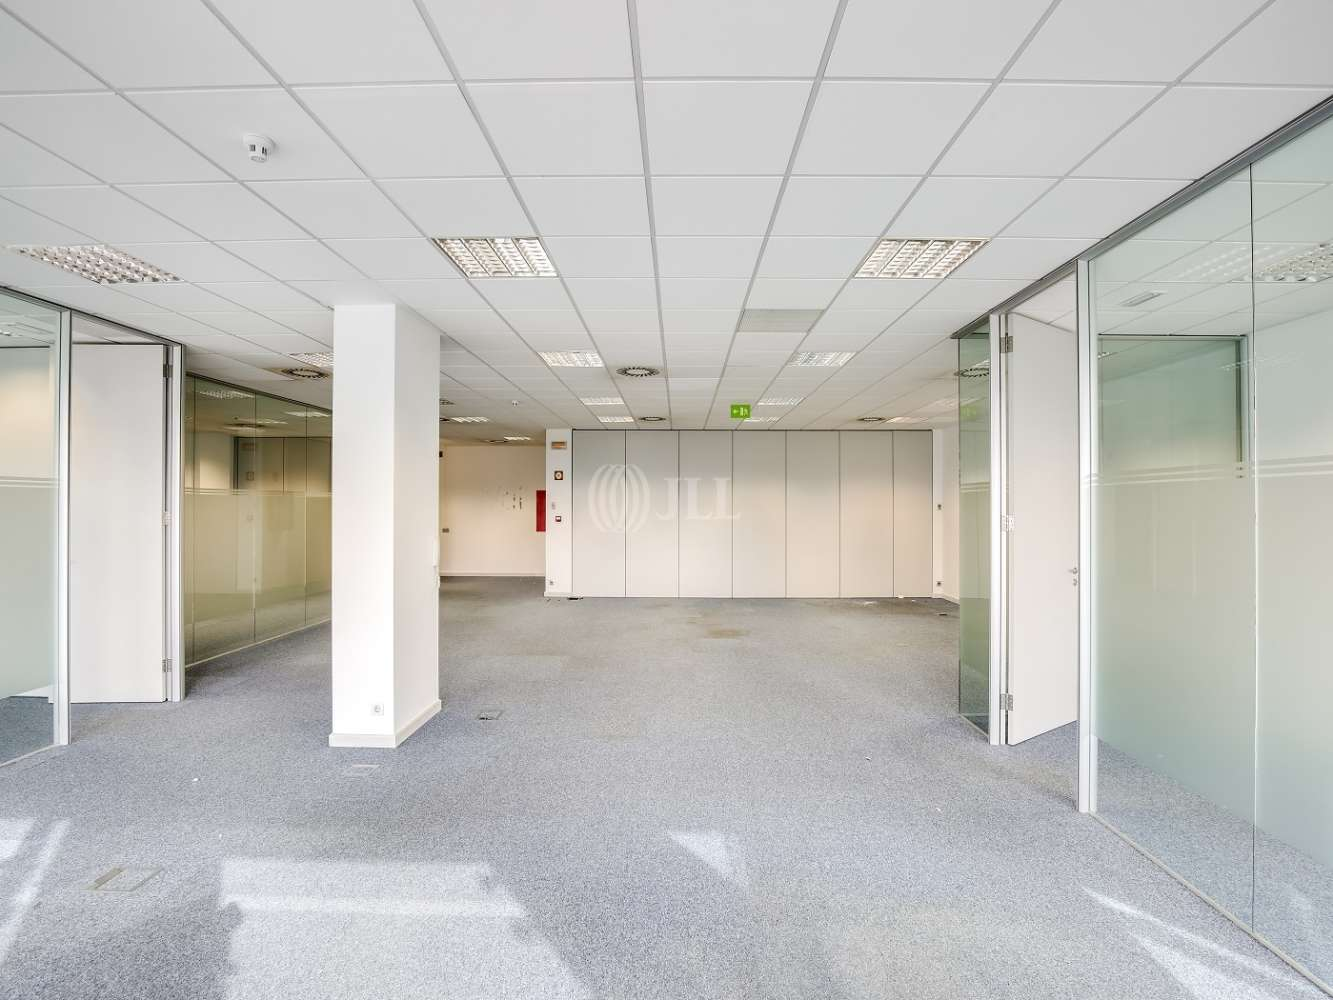 Oficina Las rozas de madrid, 28232 - Edificio 3. P.E. Alvia - 14365